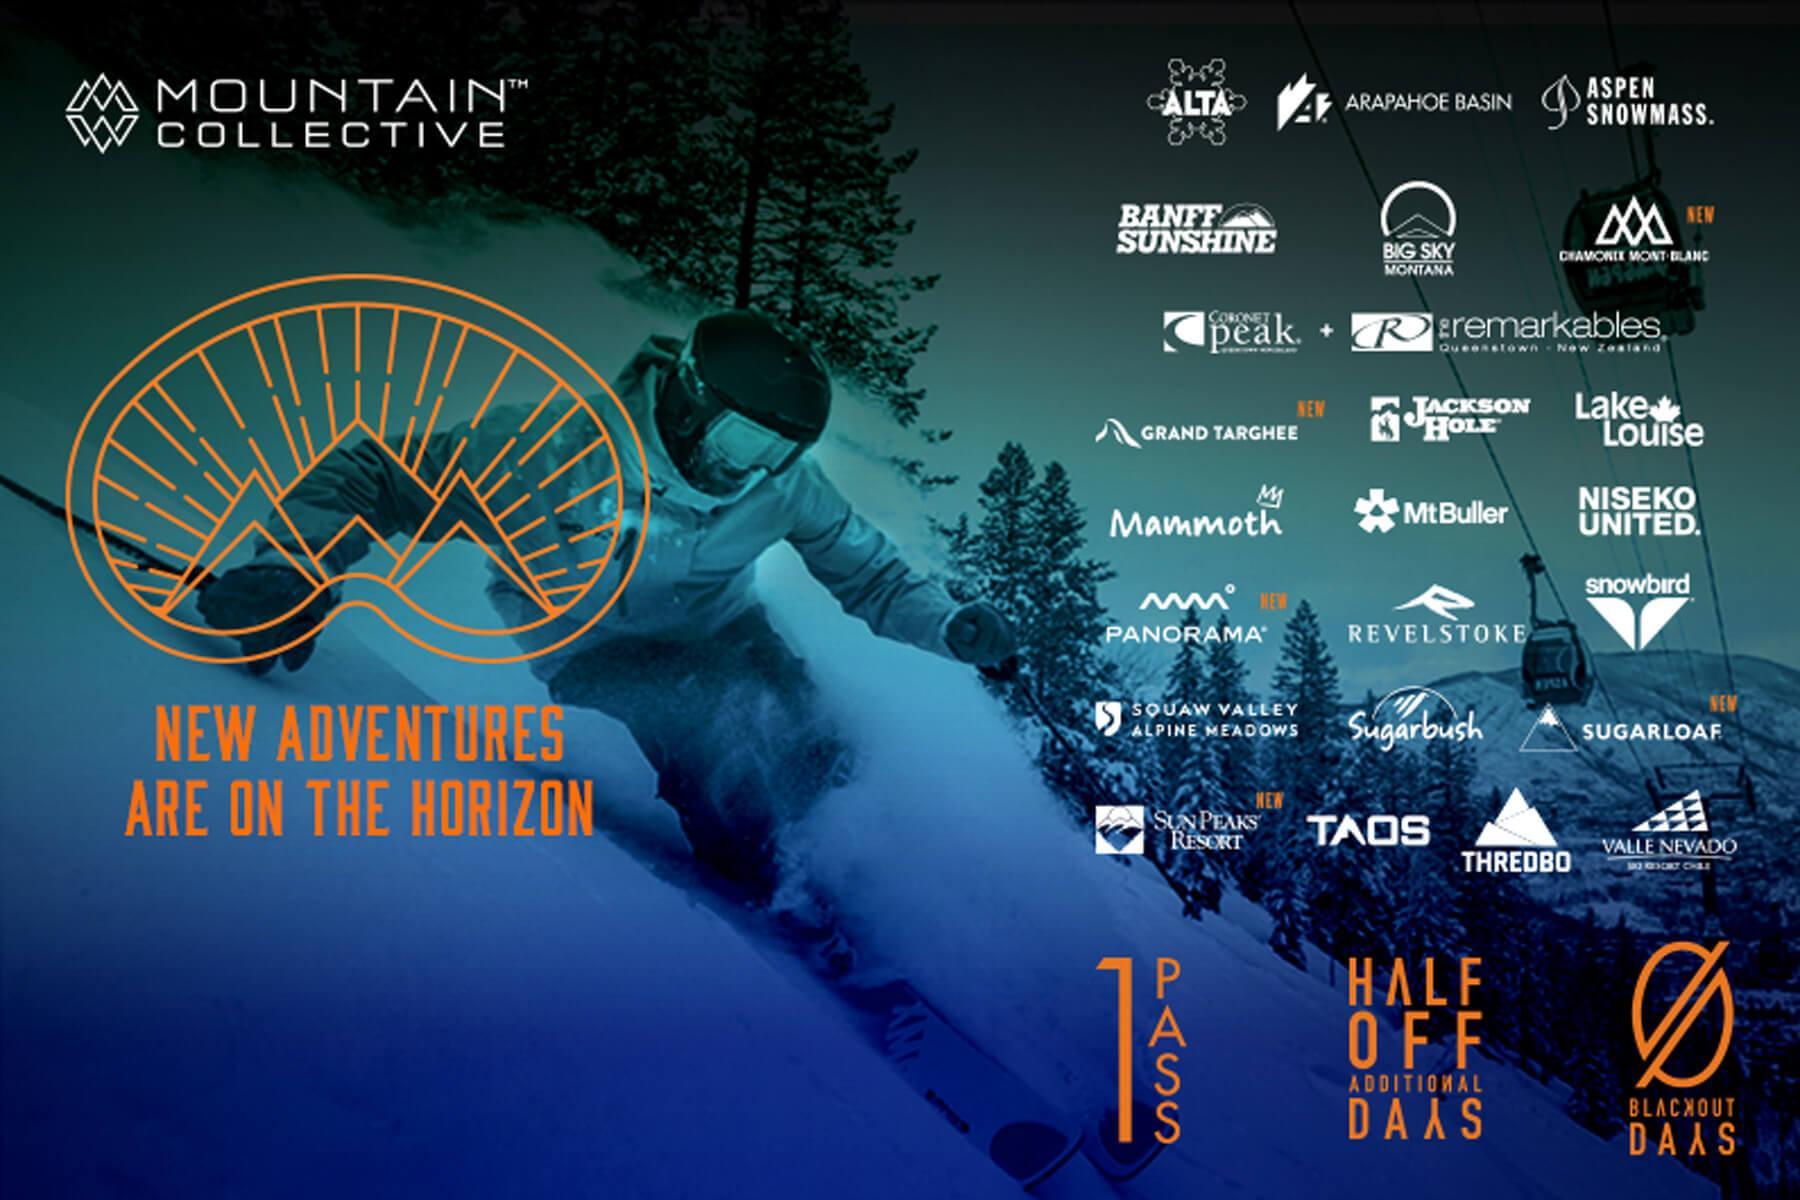 sun peaks resort, mountain collective, British Columbia, Canada,